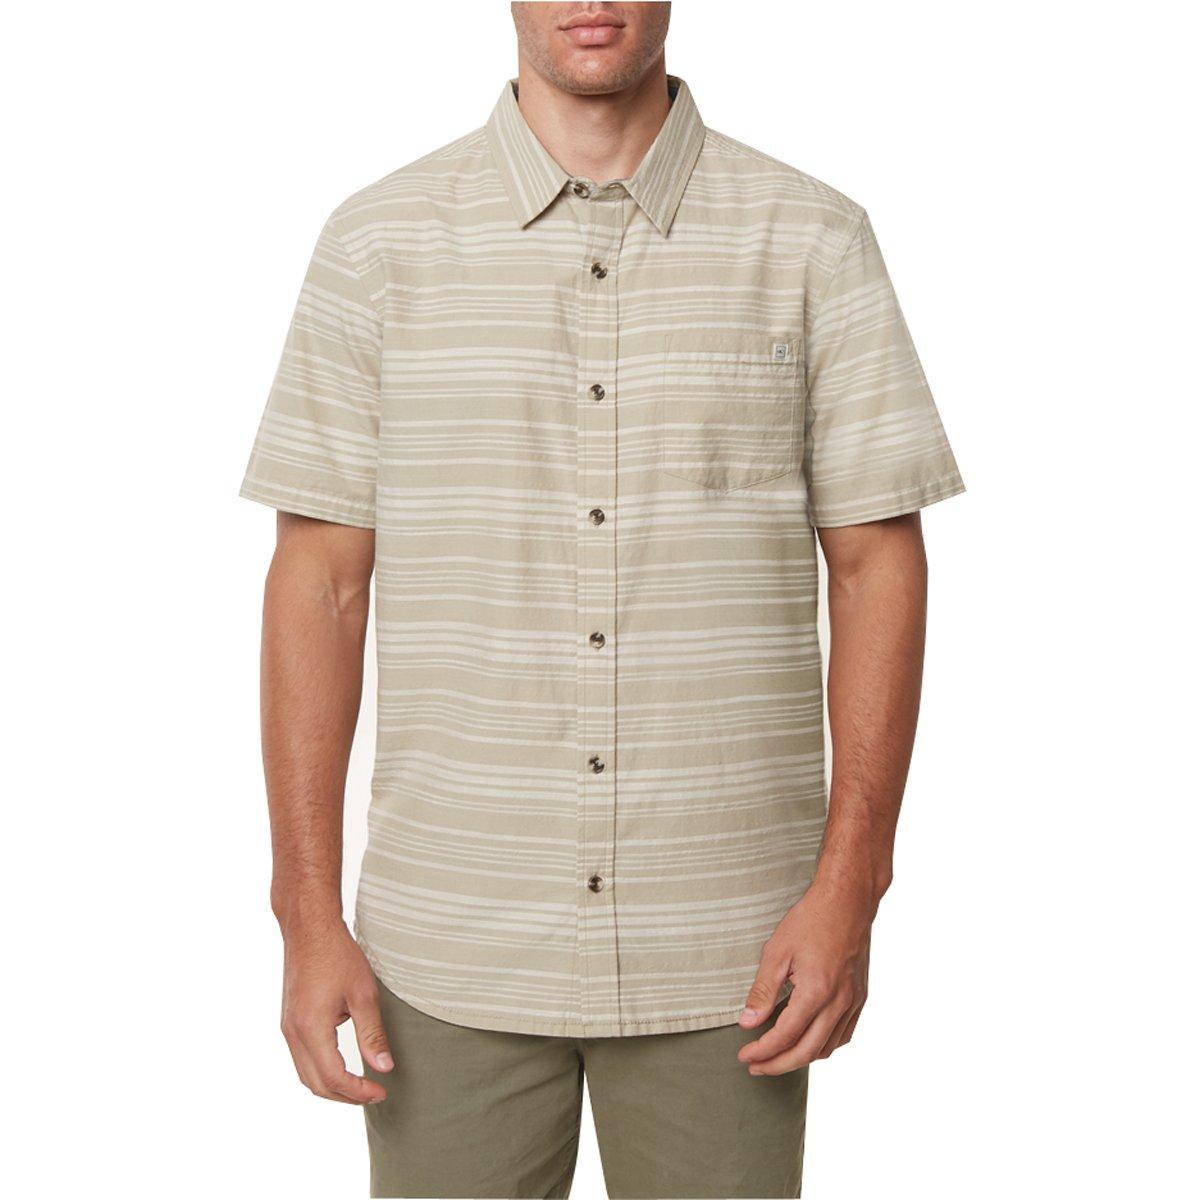 O'Neill Men's Jack Line Up Shirts X-Large Khaki SU8704208-KHA-XL